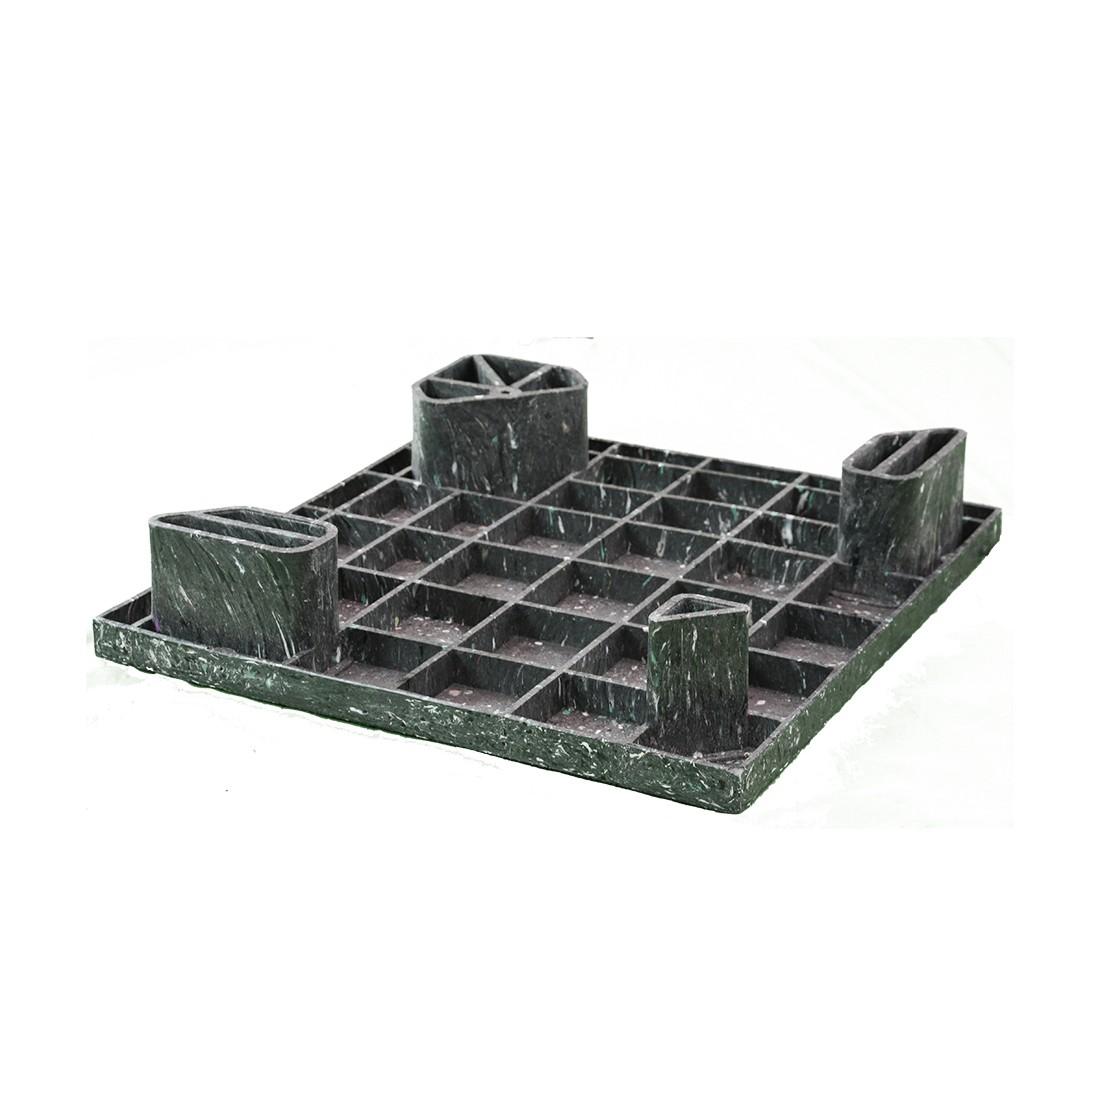 24 x 24 Hercules Solid Deck Plastic Display Pallet